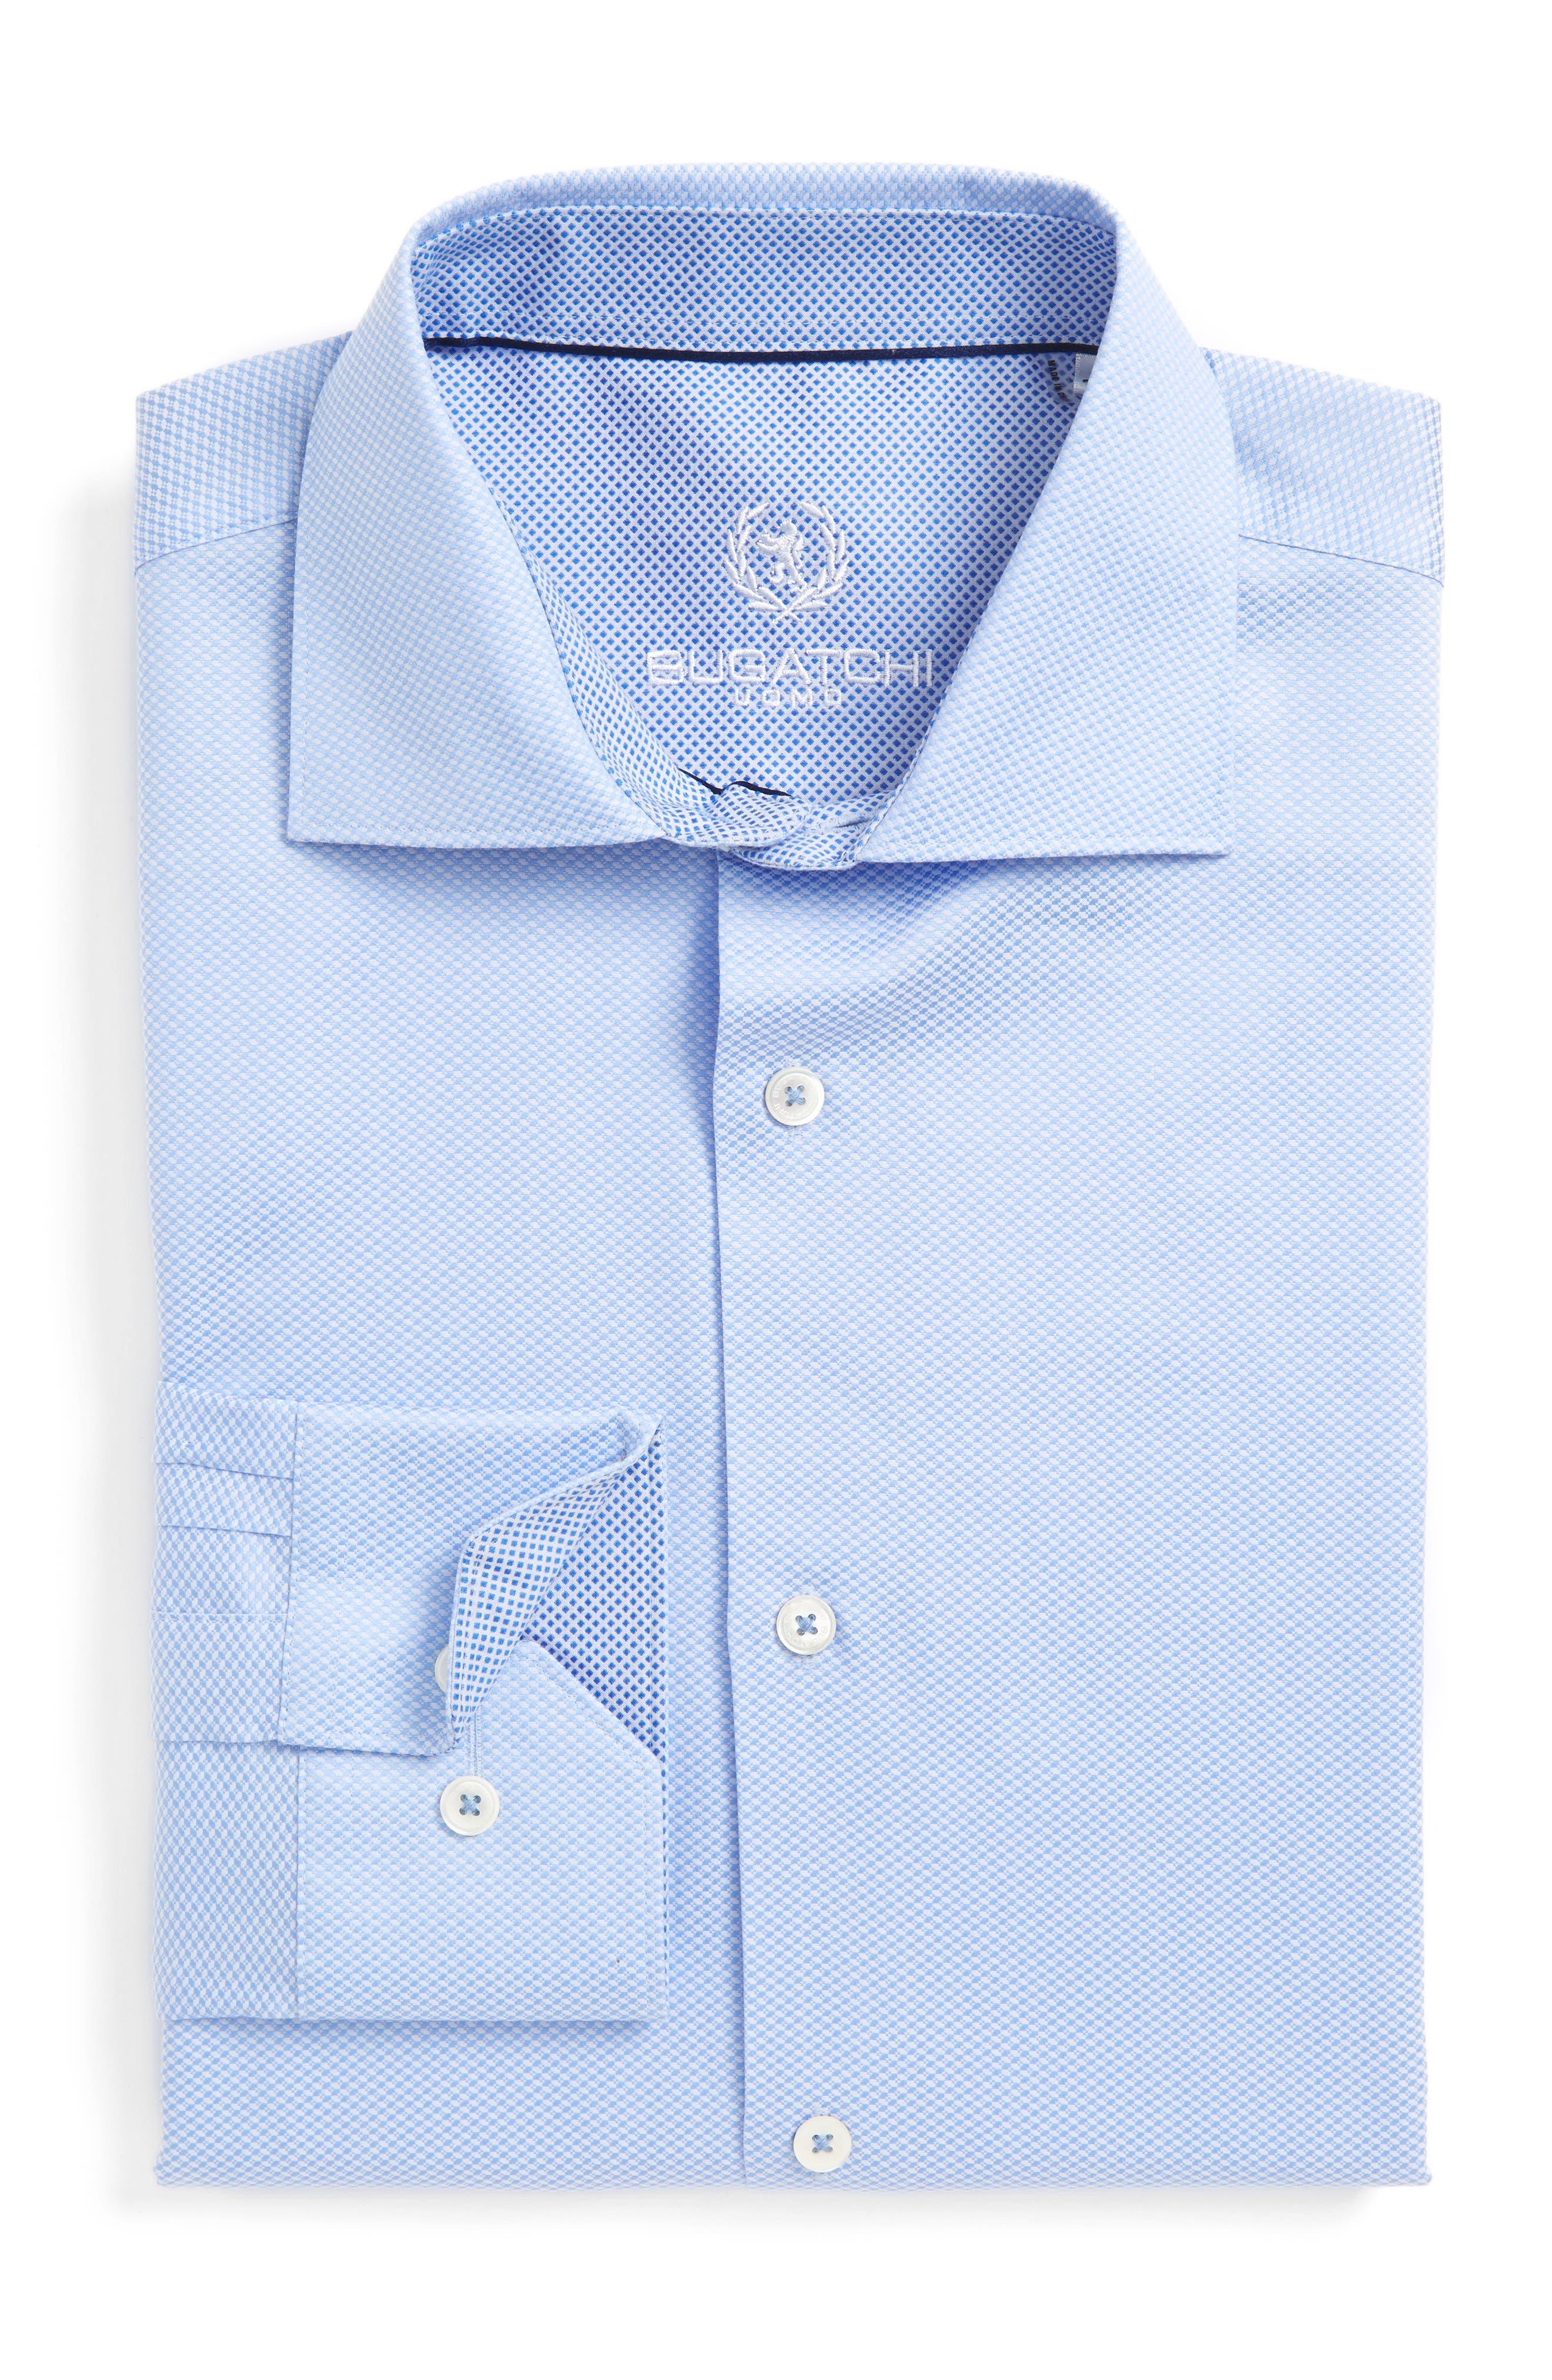 Alternate Image 1 Selected - Bugatchi Trim Fit Solid Dress Shirt